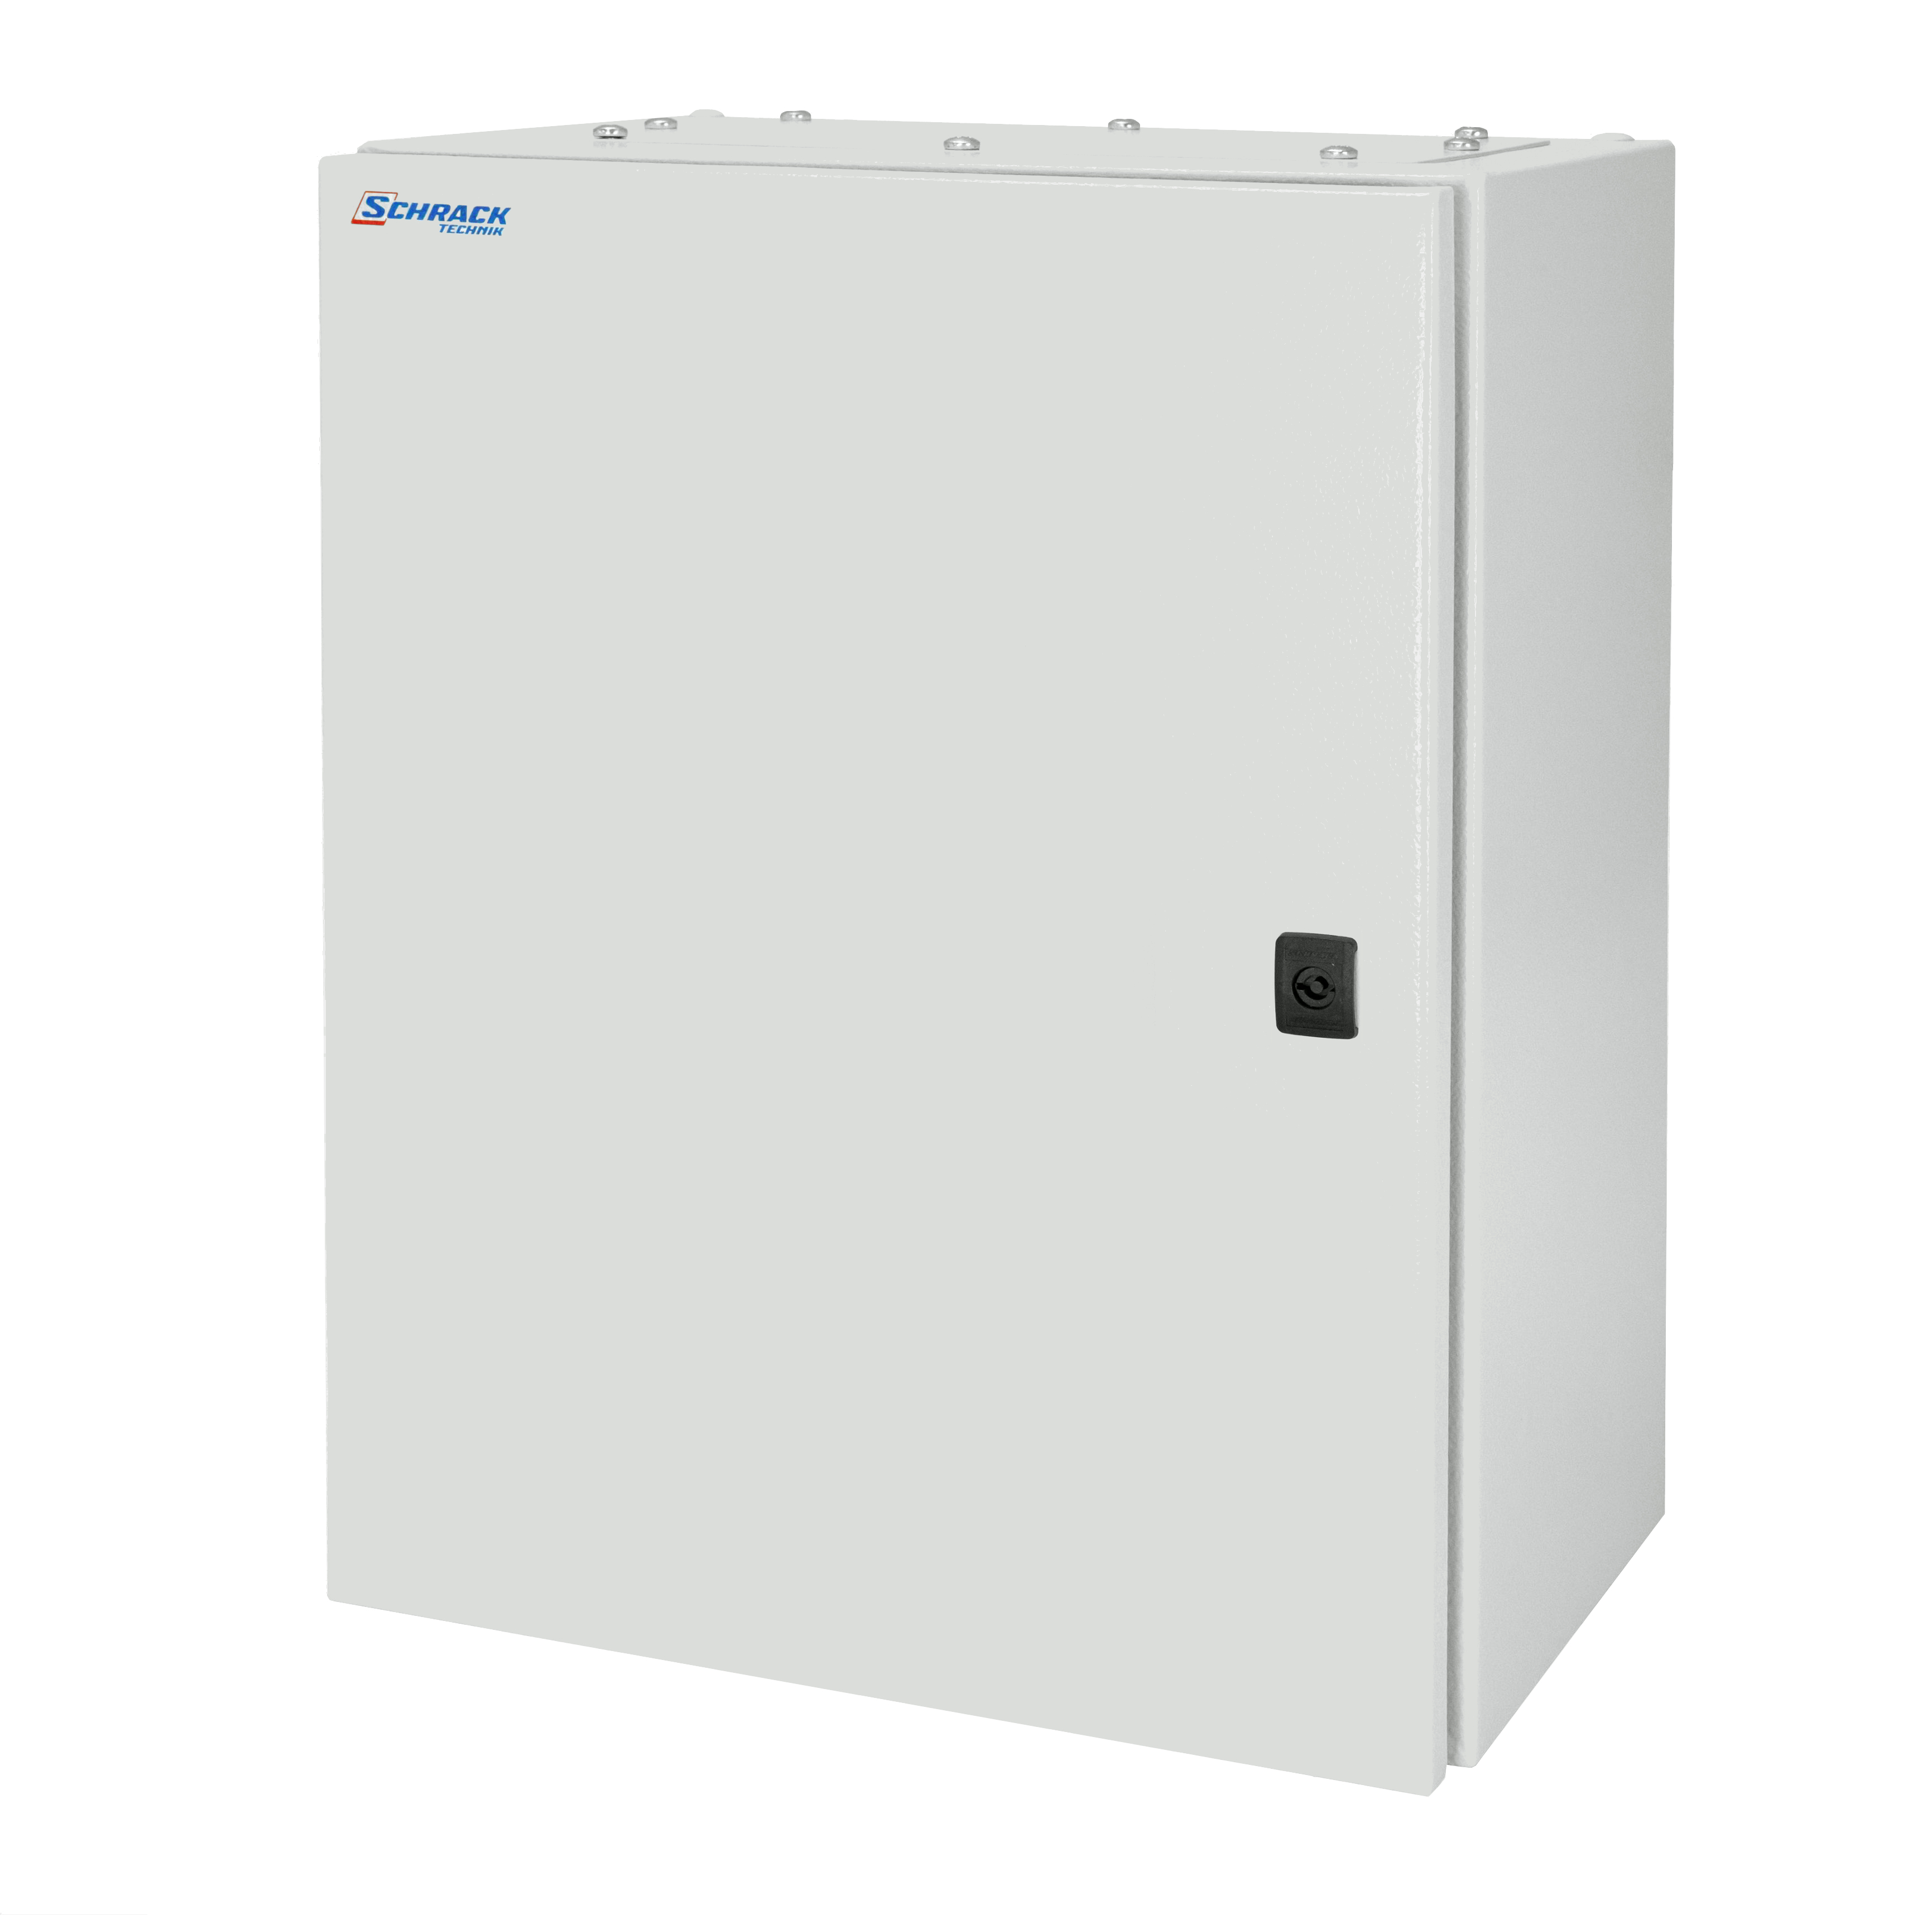 1 Stk Wandschrank Mono IP66 H=300 B=300 T=155 Stahlblech WSM3030150